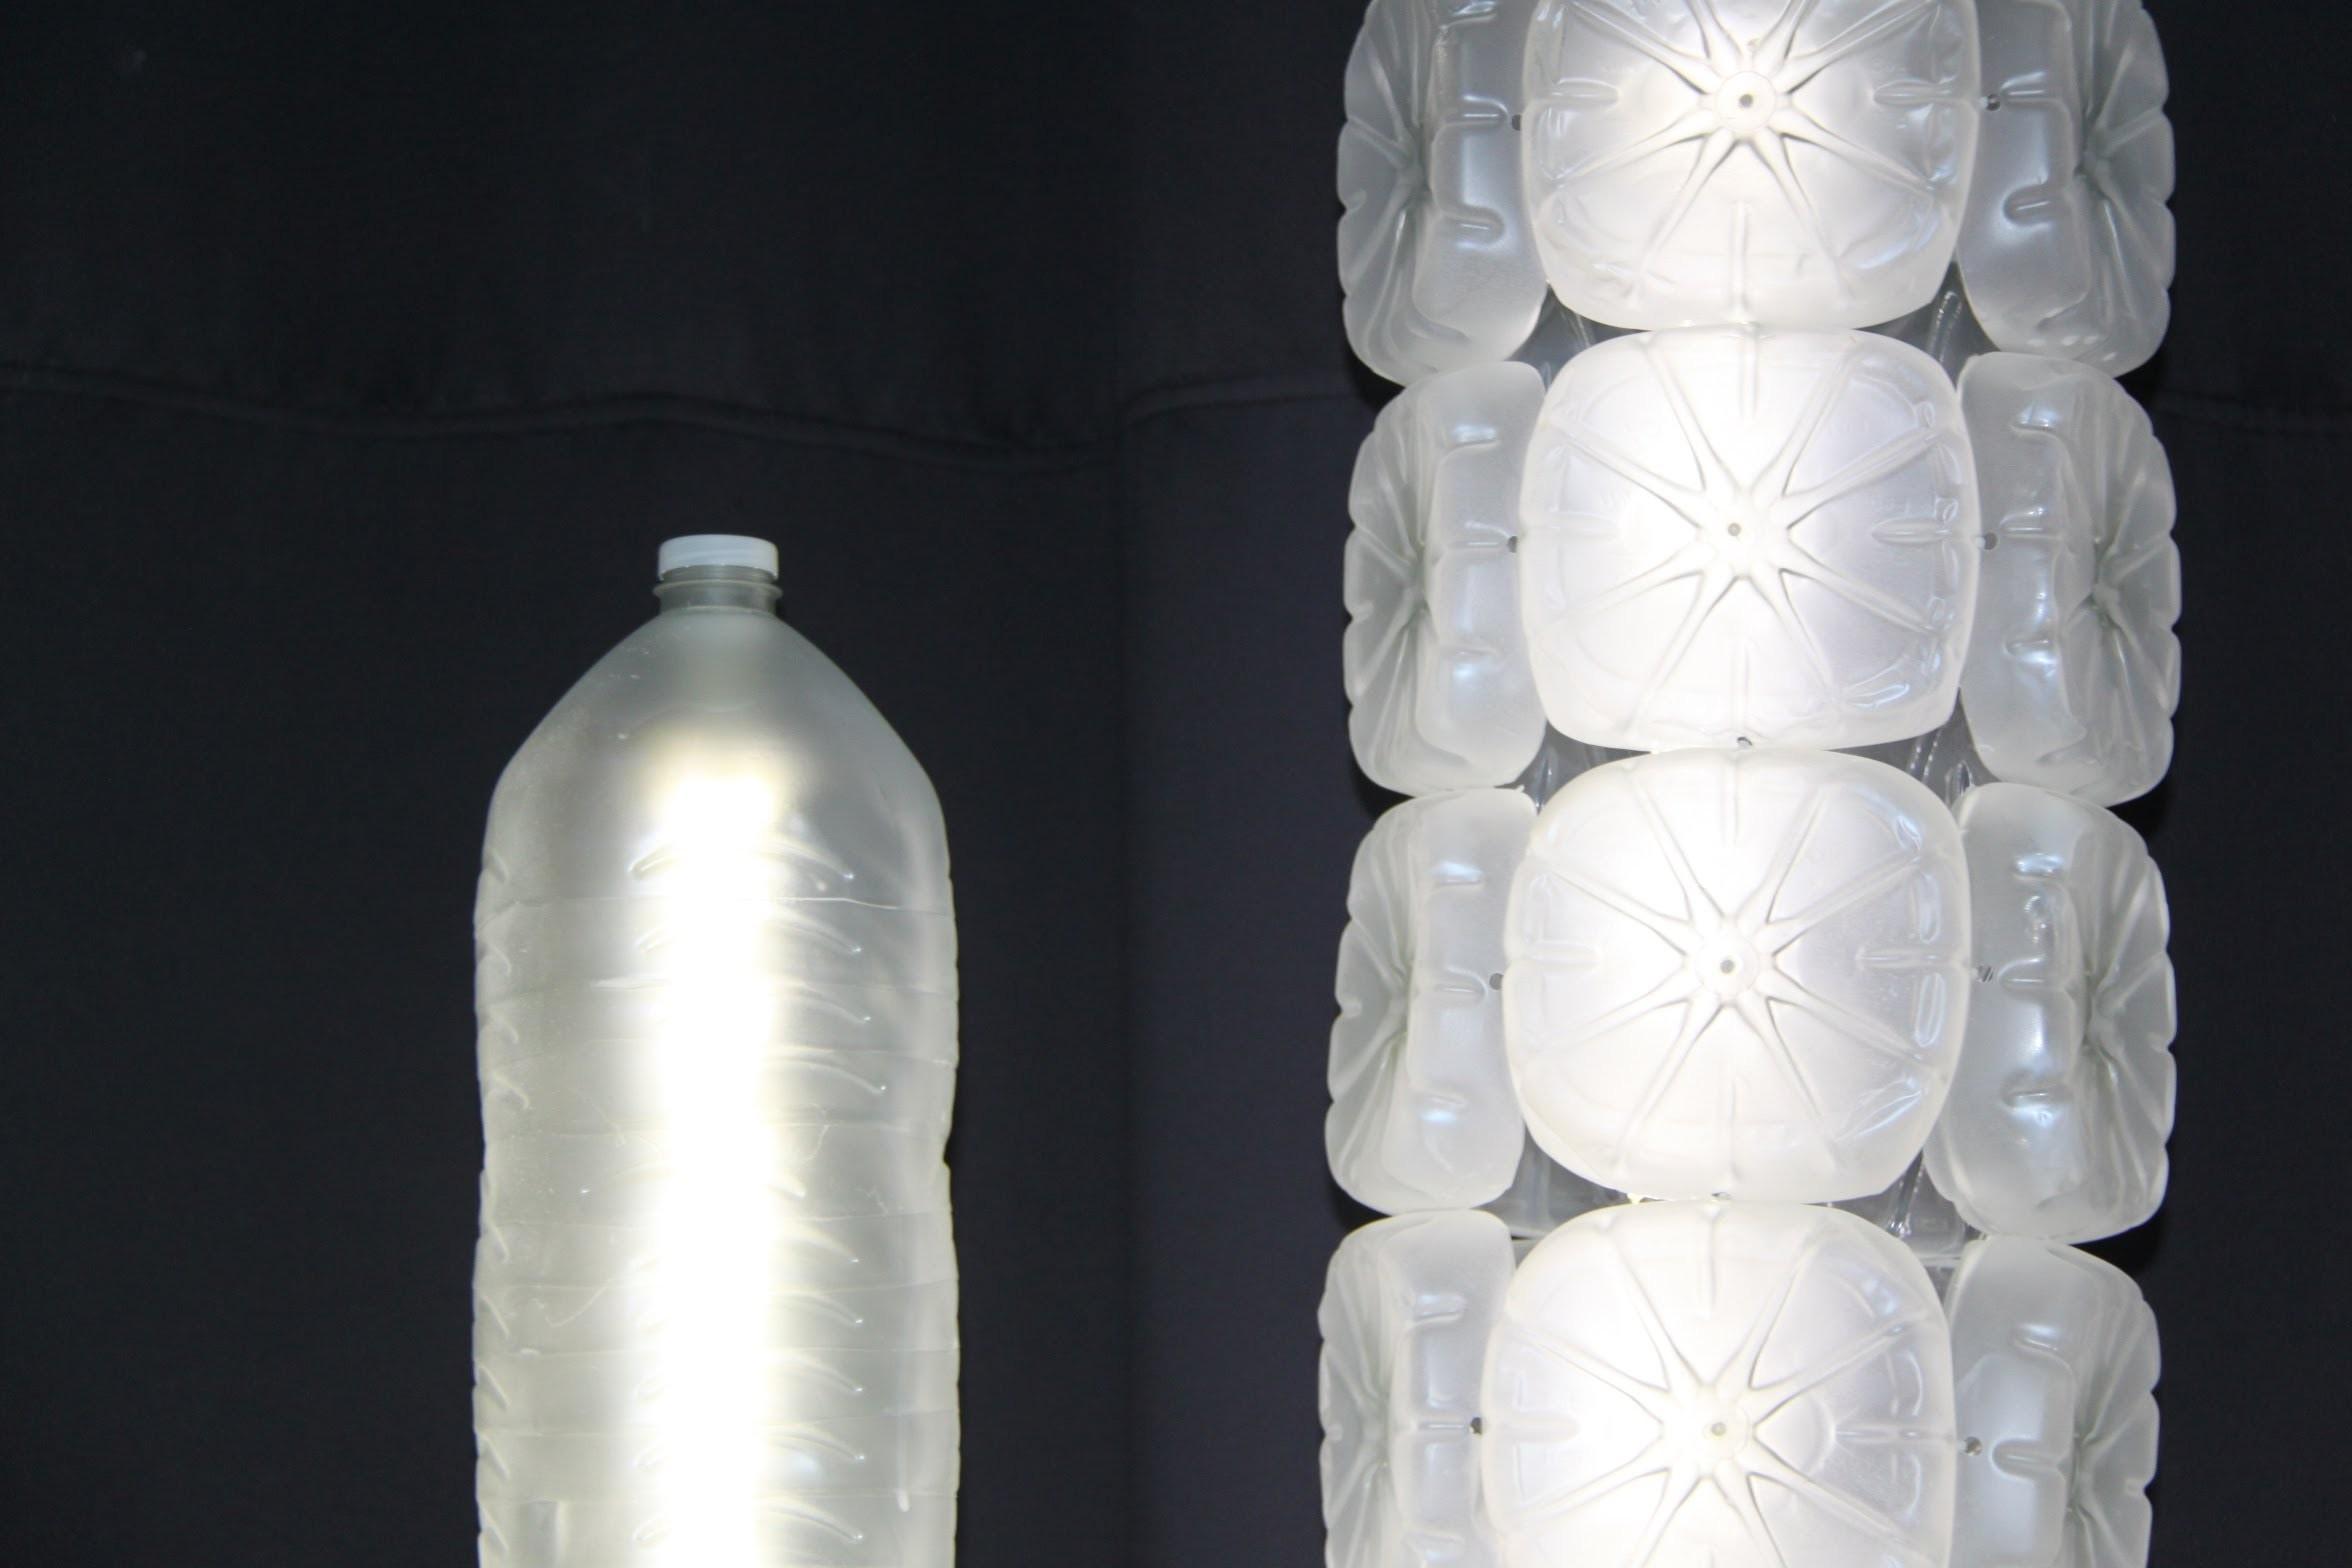 Lámpara realizada con garrafas de plástico recicladas - Lamp made with recycled plastic bottles